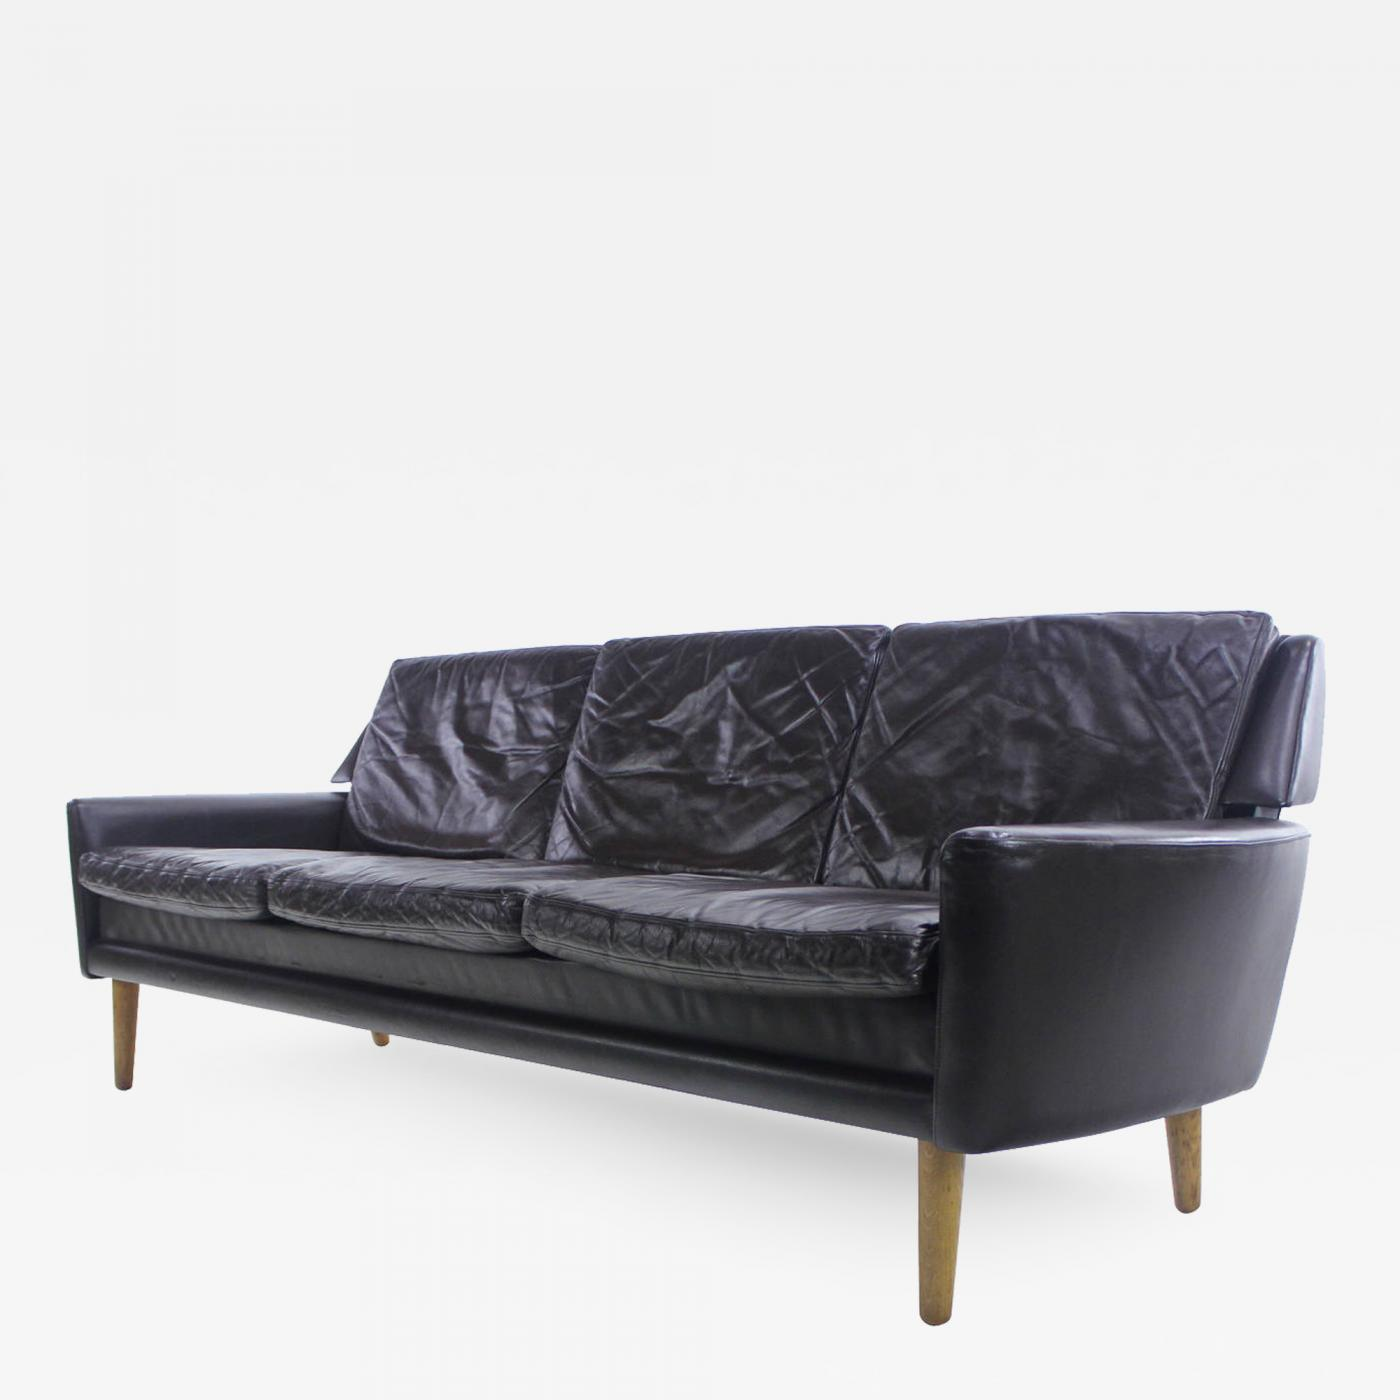 Erik Wørts - Danish Modern Leather Sofa Designed by Erik Worts